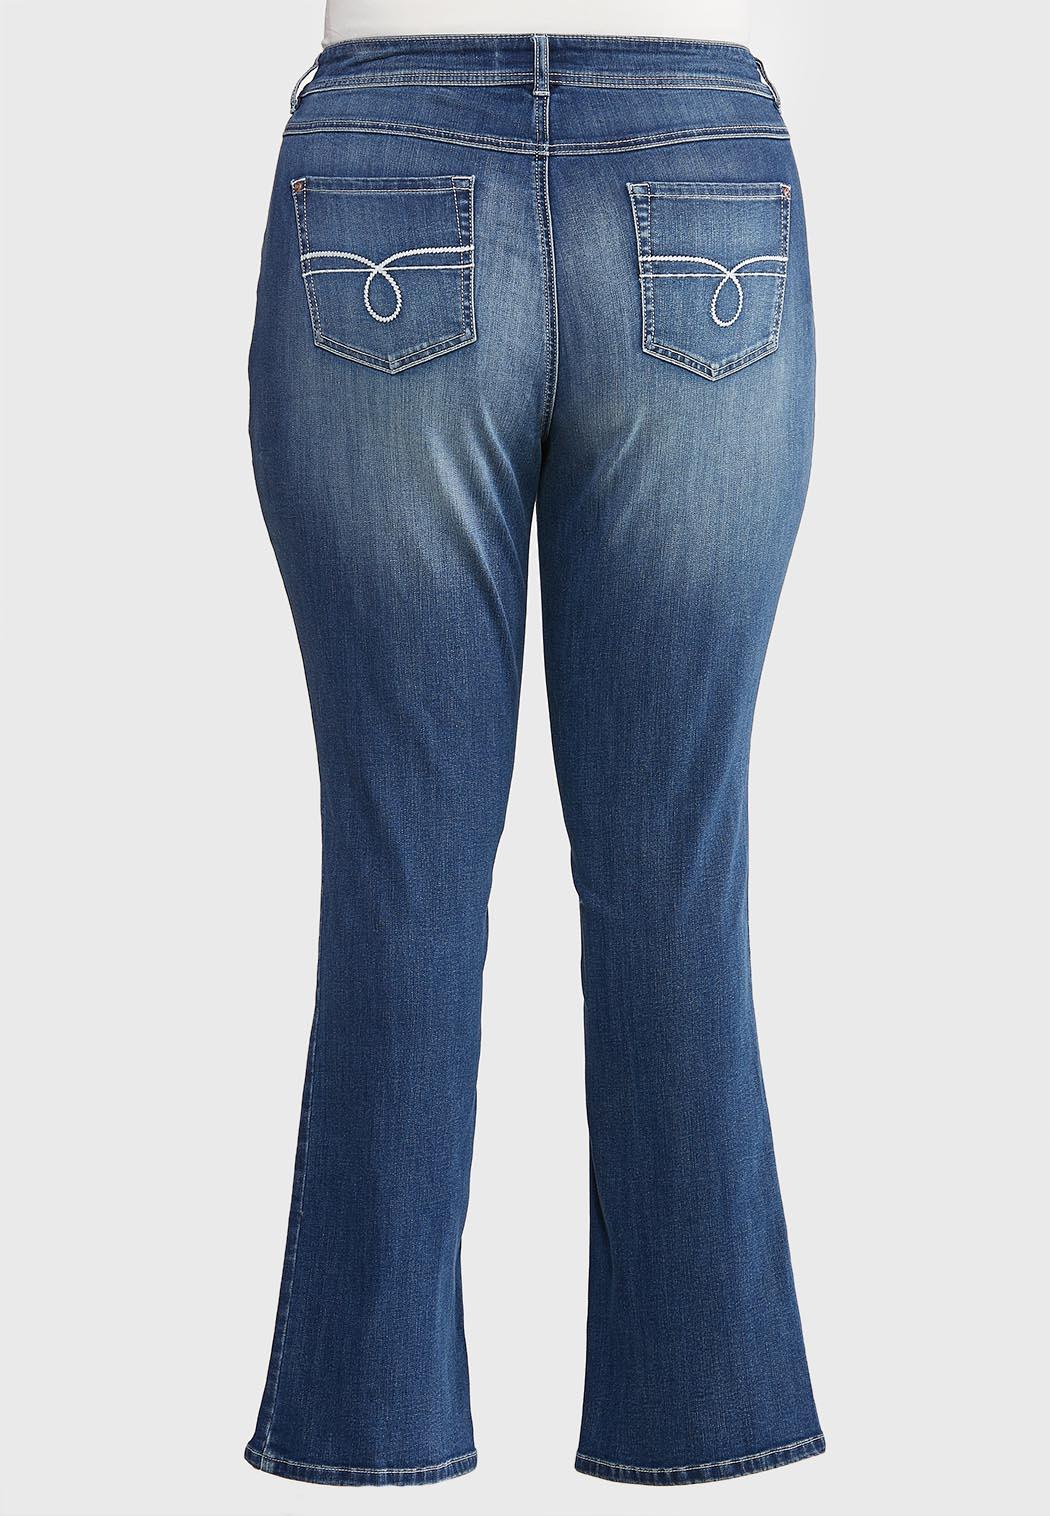 Plus Size Dark Wash Bootcut Jeans (Item #43929406)